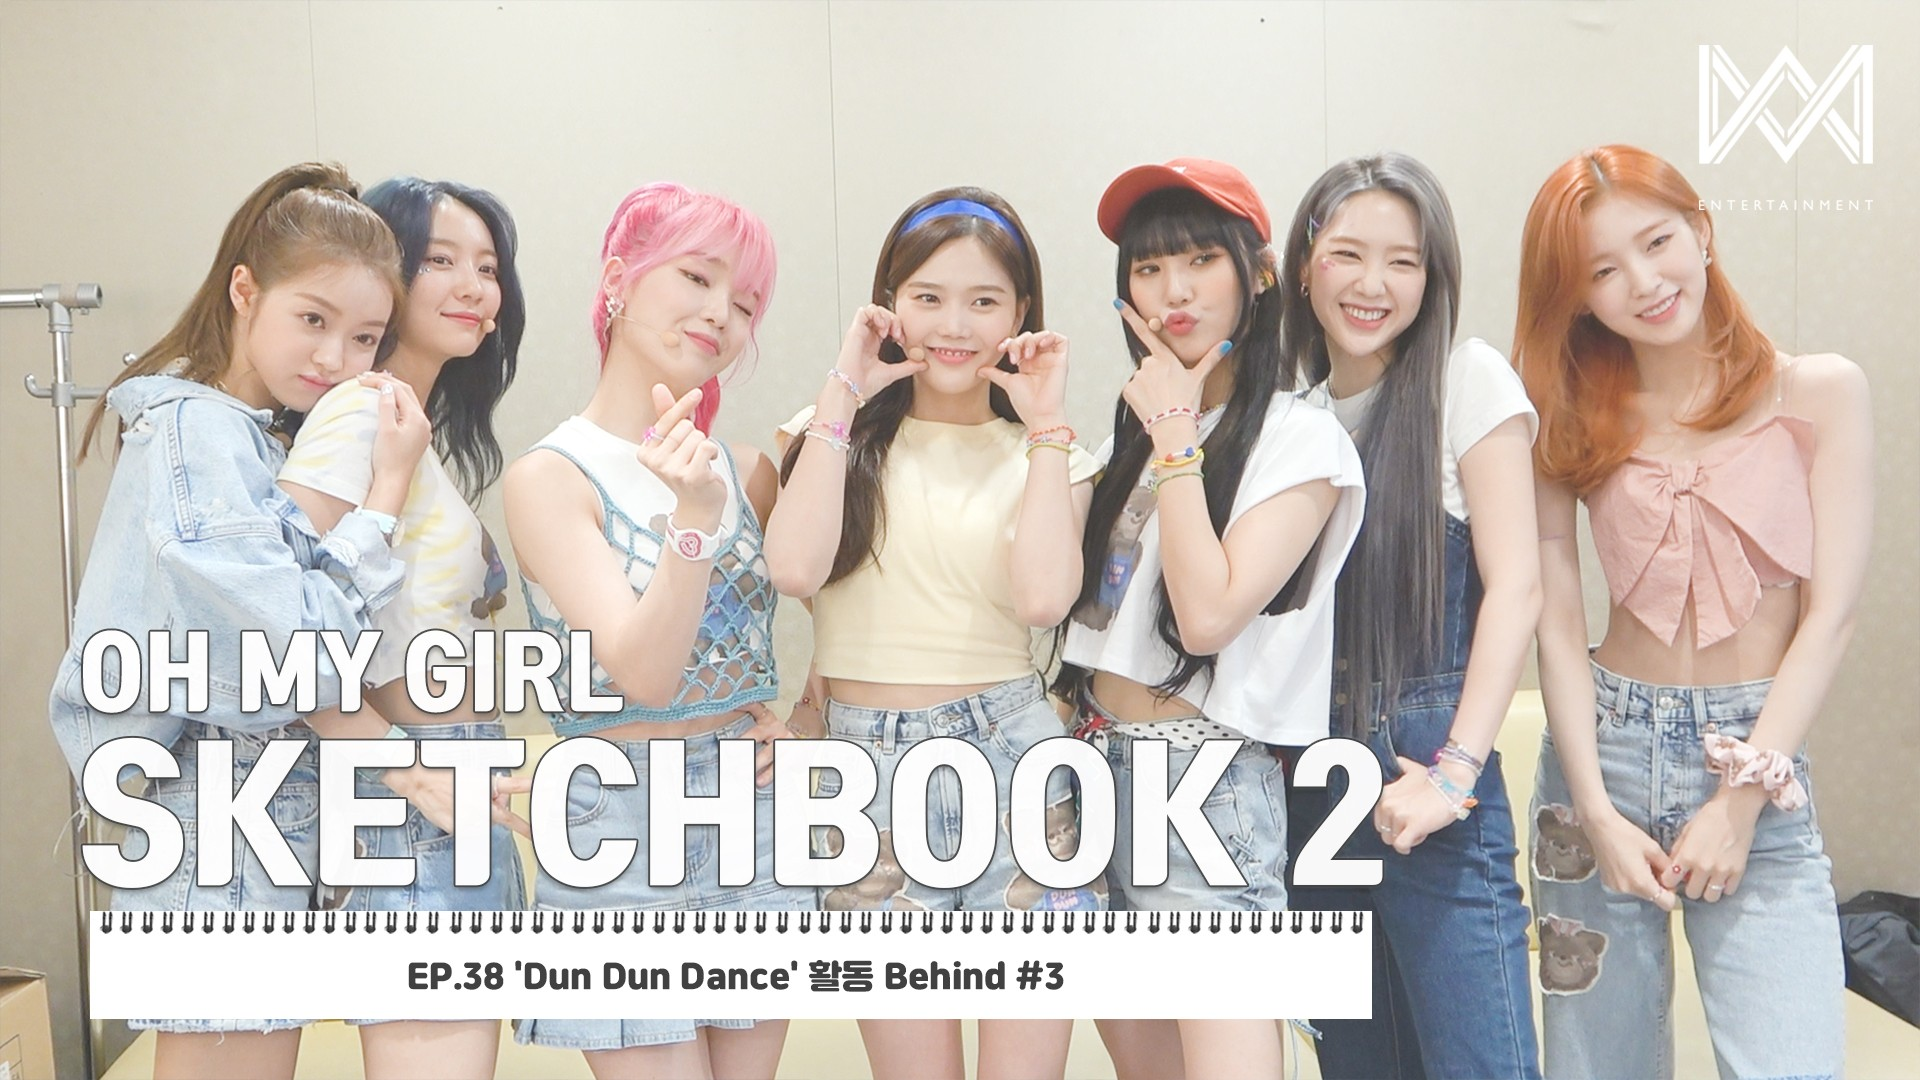 [OH MY GIRL SKETCHBOOK 2] EP.38 'Dun Dun Dance' 활동 Behind #3